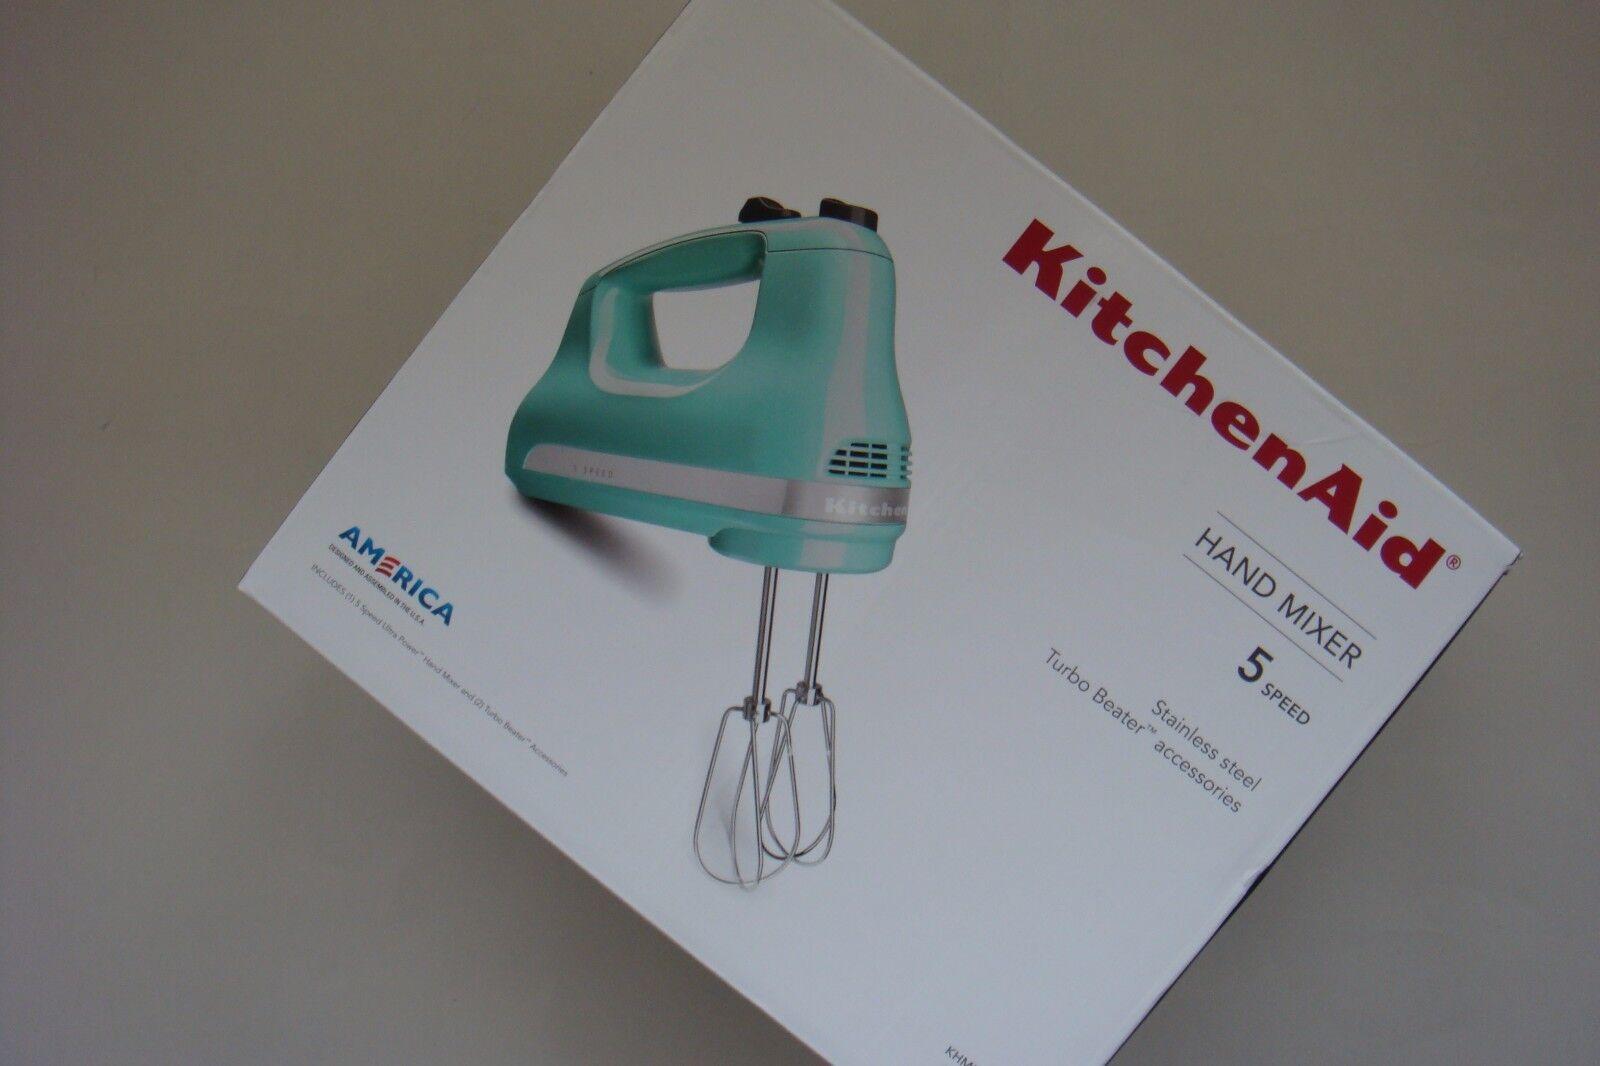 Nouveau KitchenAid main mixeur 5 vitesses Aqua Sky (haqa) KHM512AQ